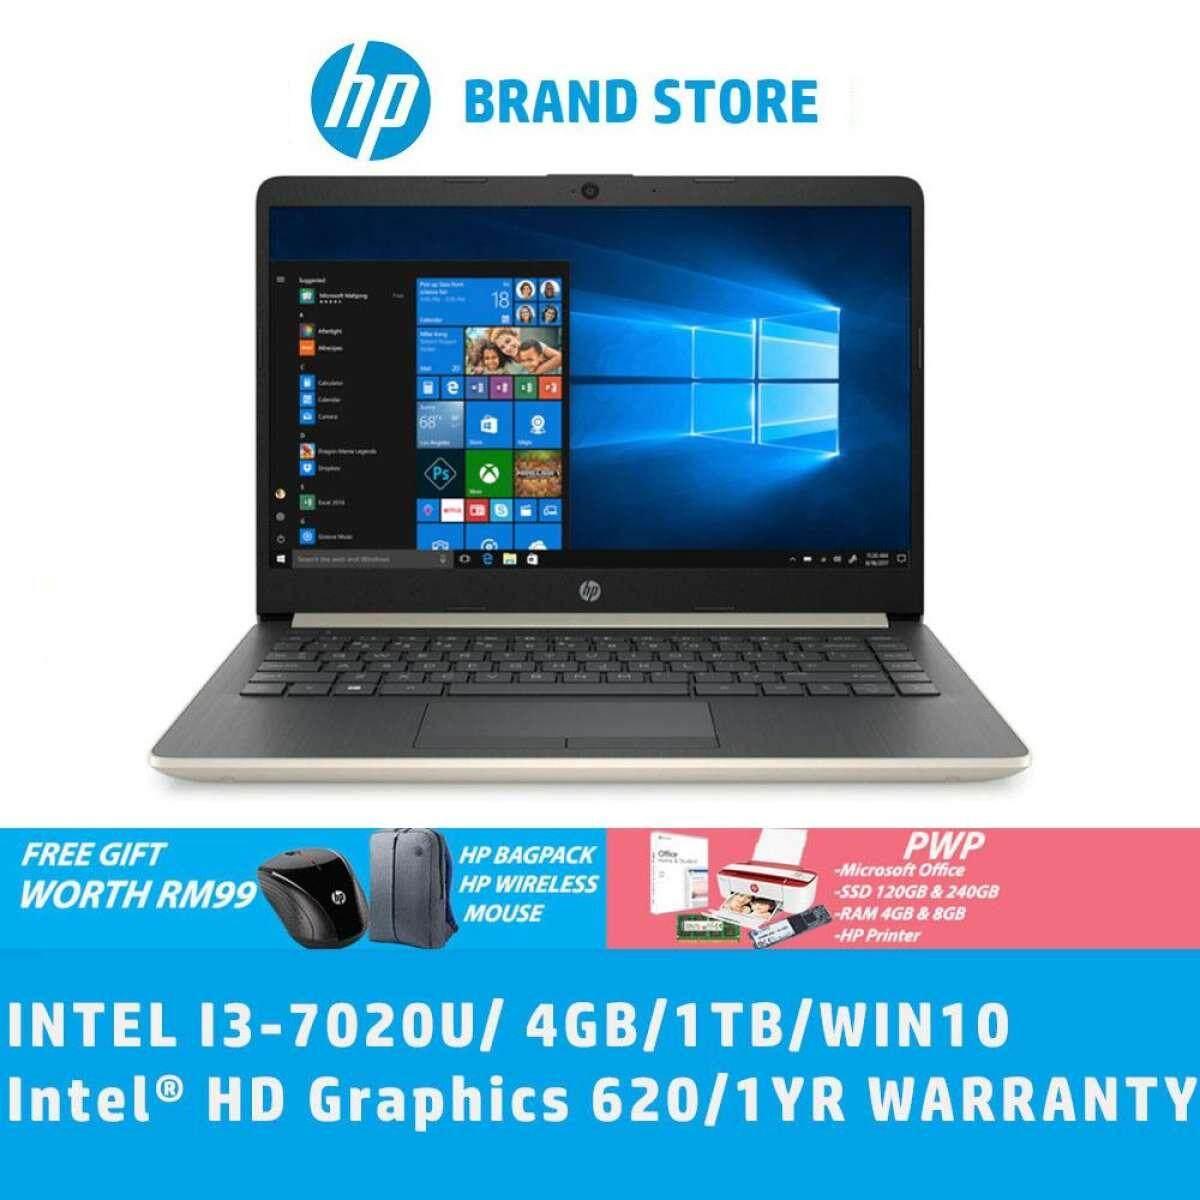 HP 14s-Cf0066TU (GOLD) / HP 14s-Cf0067TU (SILVER) (I3-7020U, 4GB, 1TB, W10 ) Malaysia